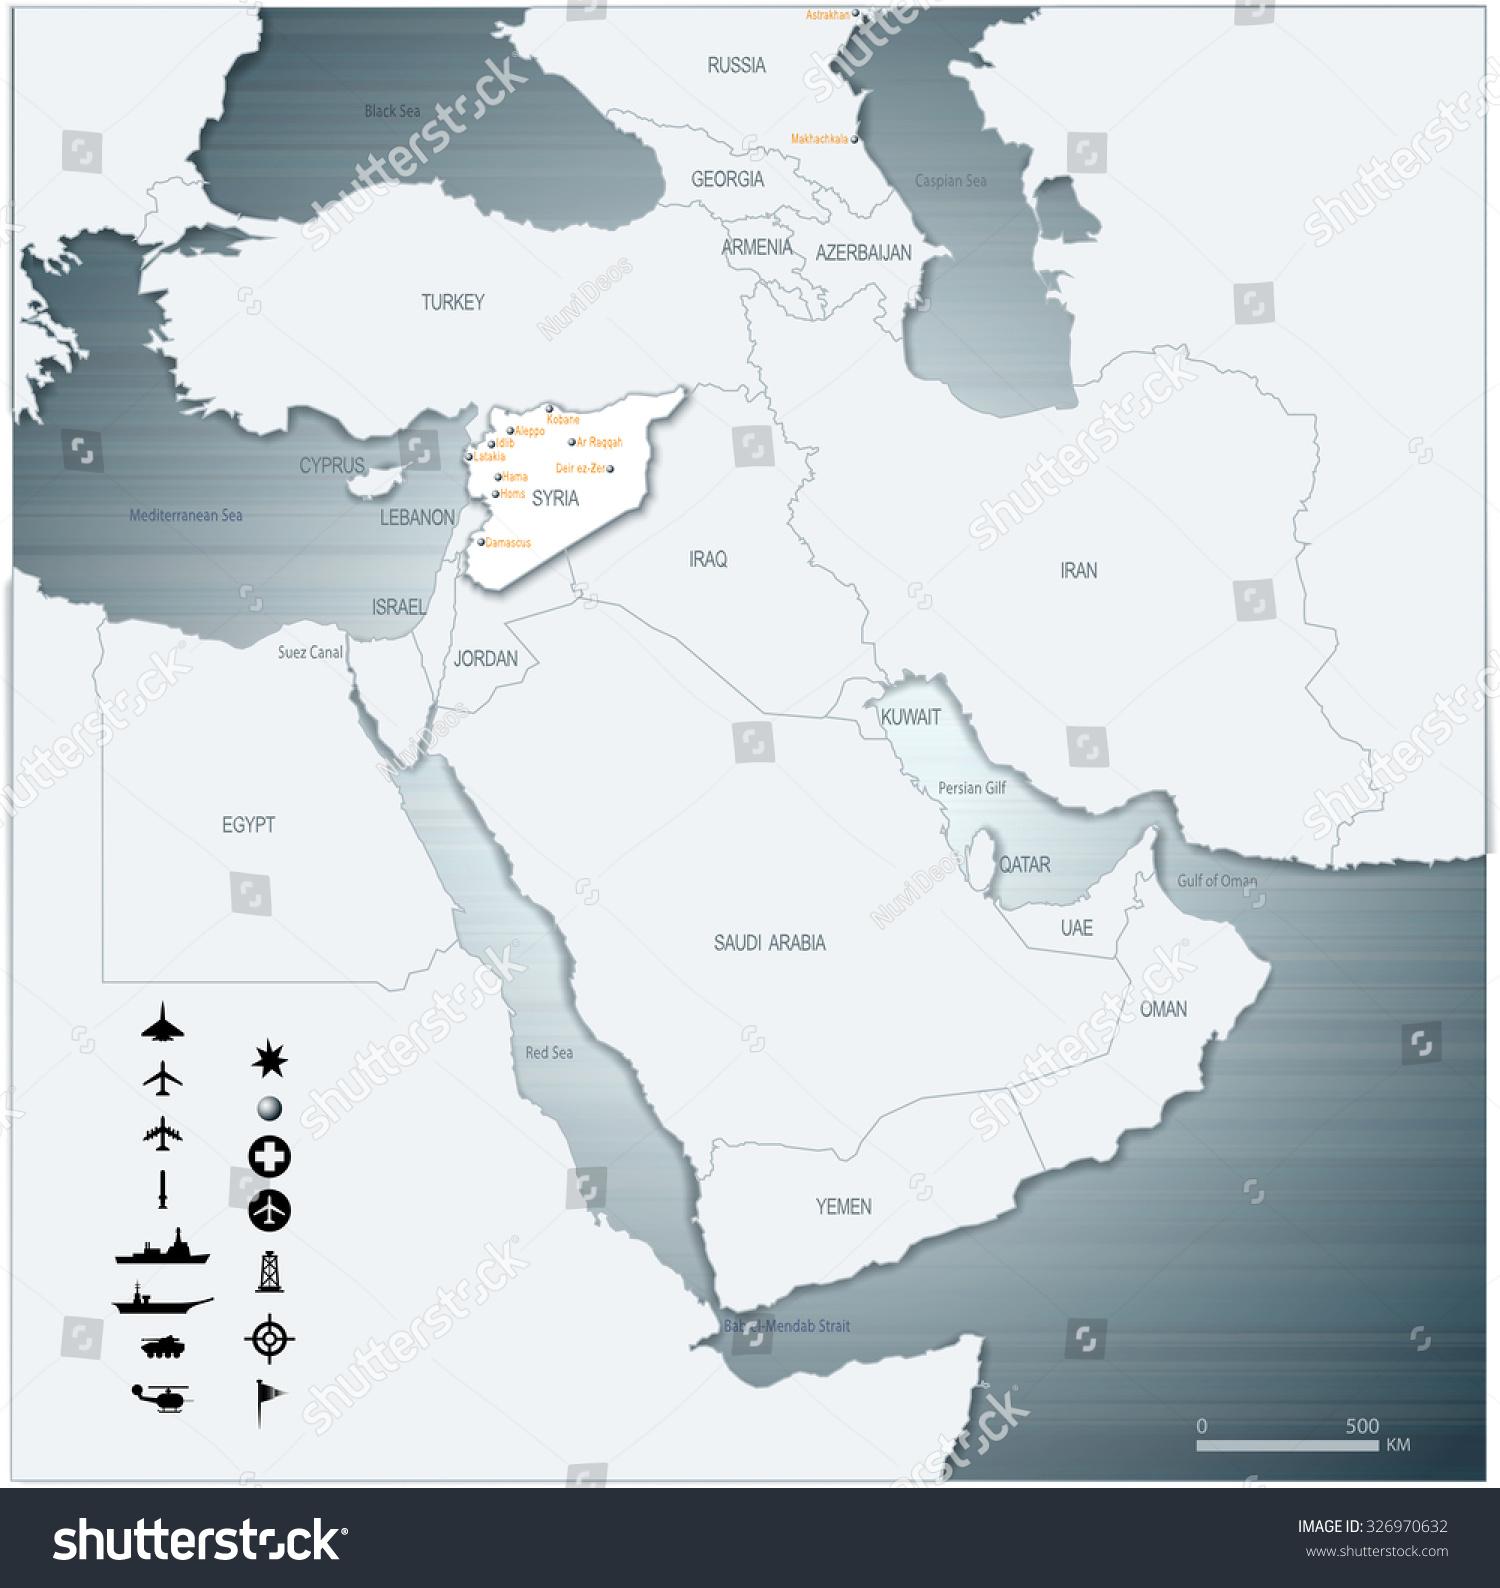 Vector map middle east syria war stock vector 326970632 shutterstock vector map of middle east syria with war legend 3d illustration eps10 gumiabroncs Choice Image